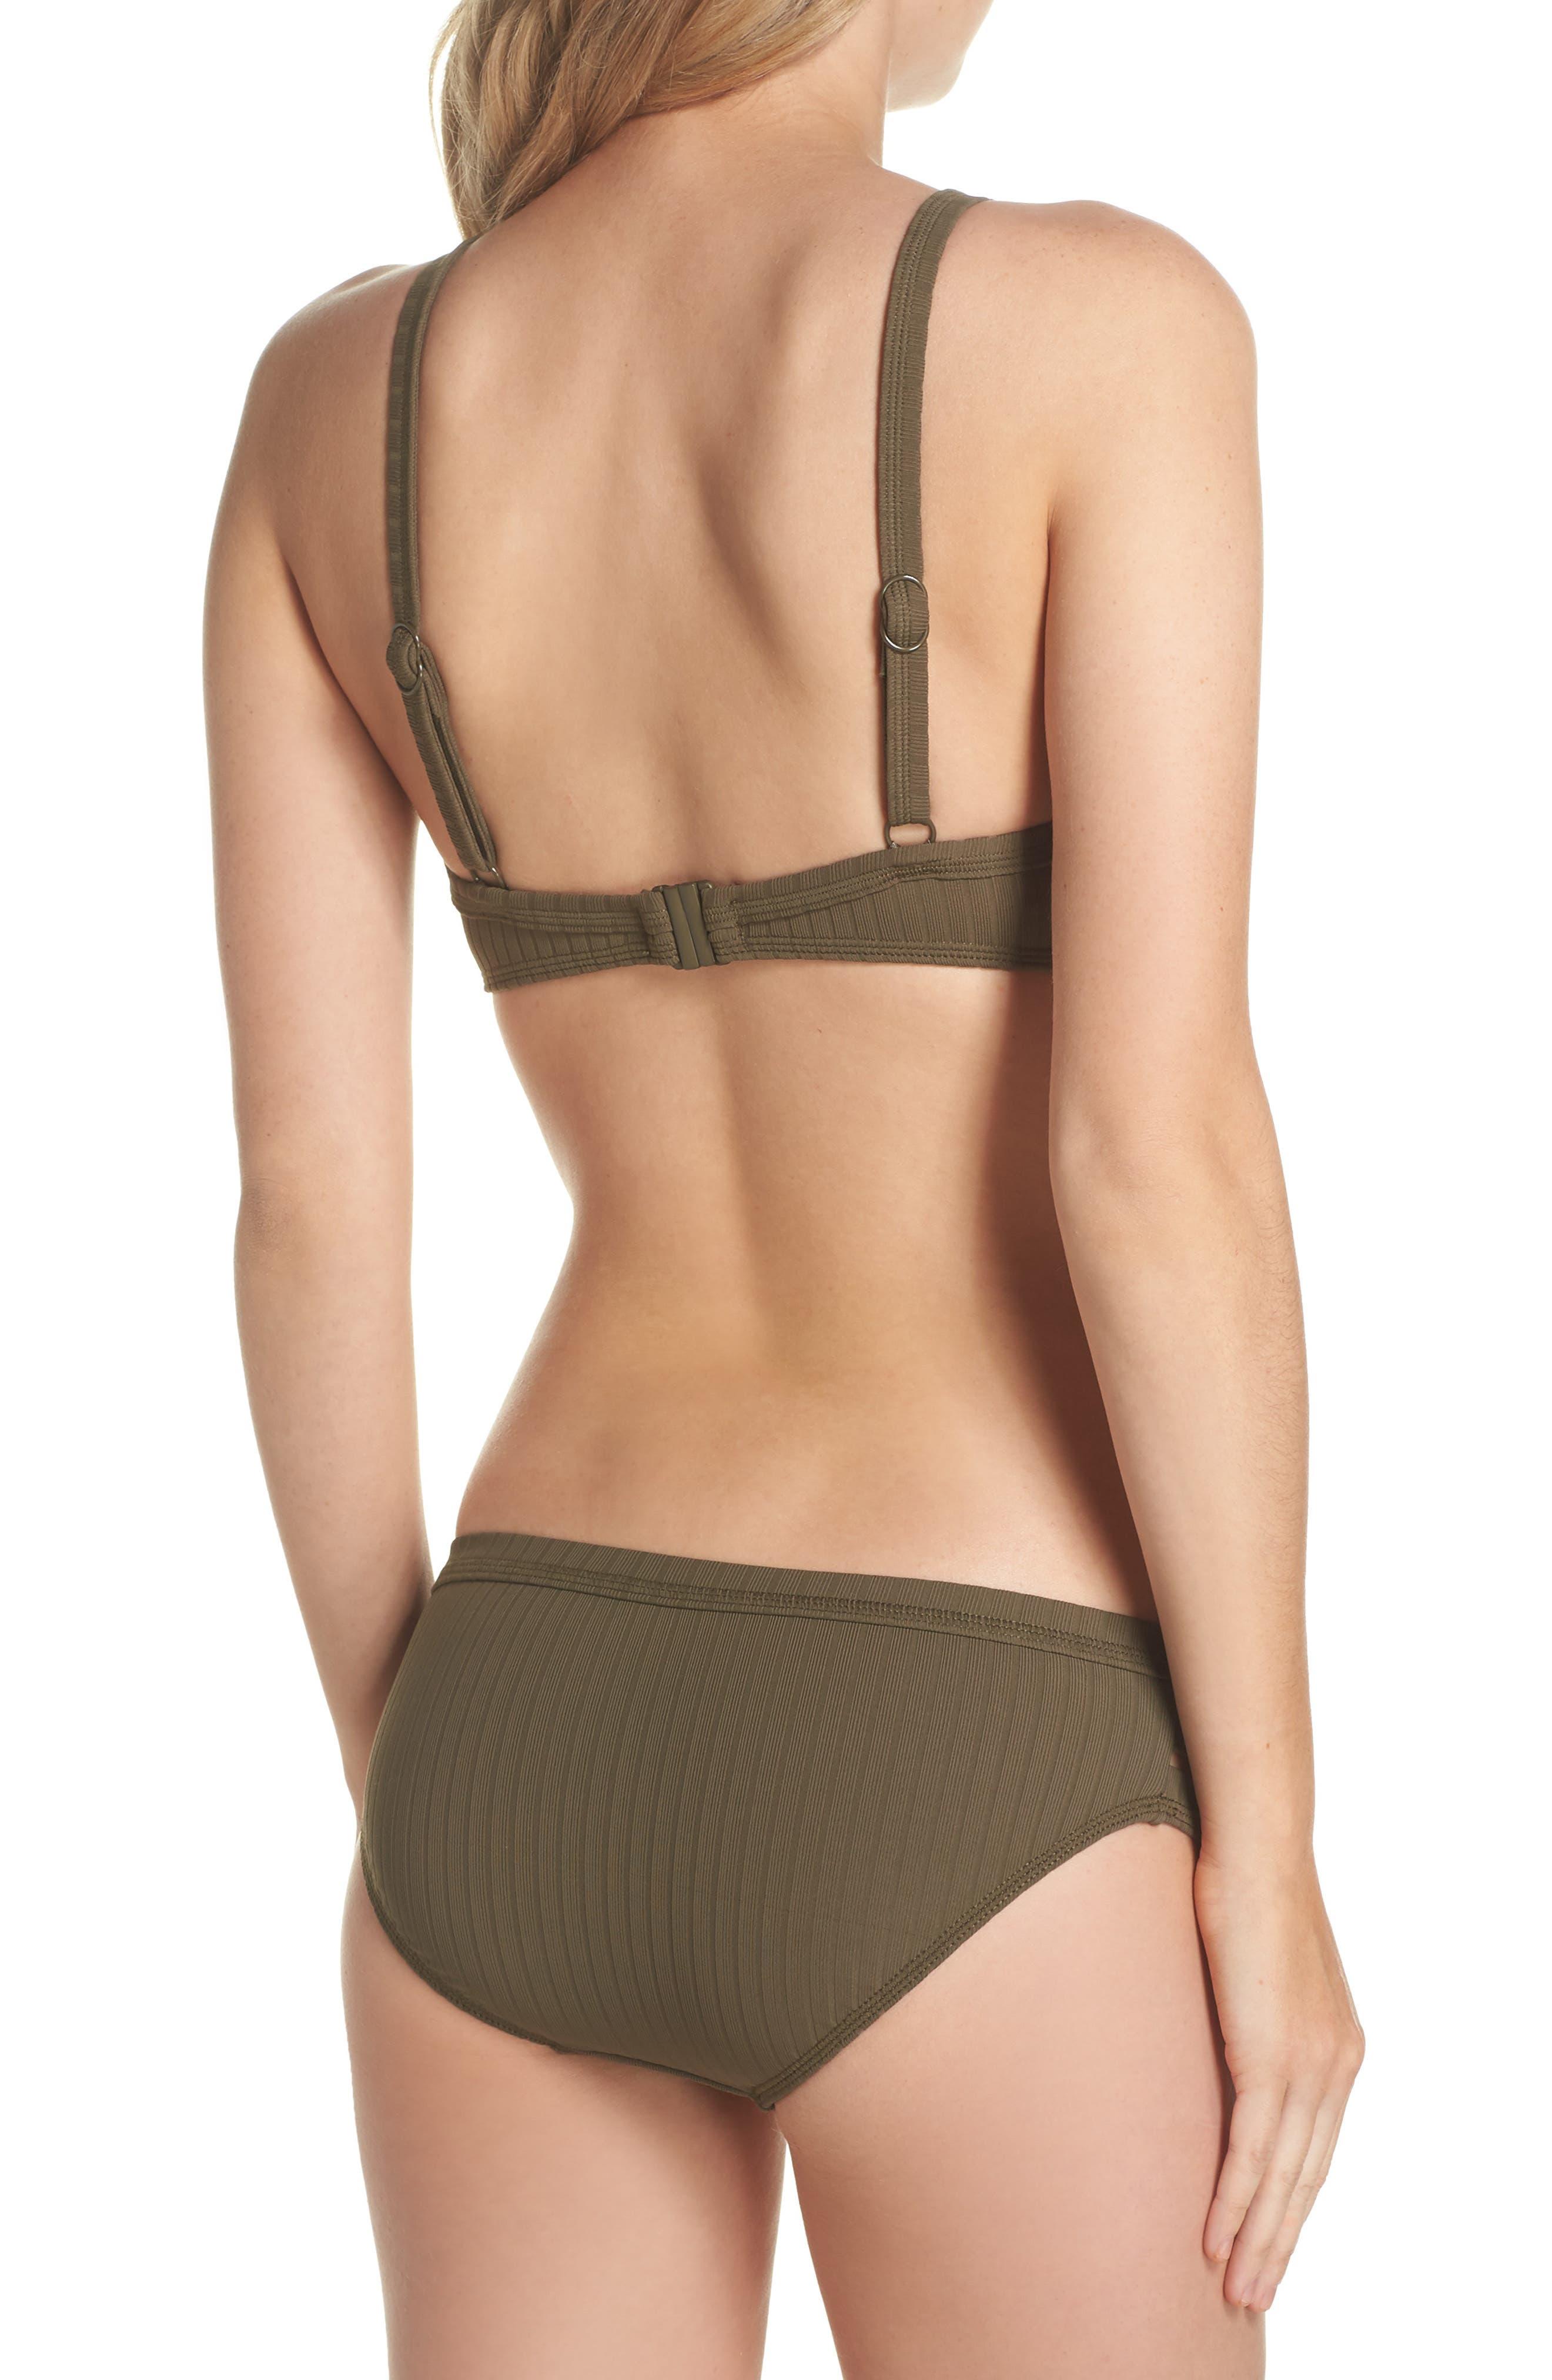 Inka Ribbed Hipster Bikini Bottoms,                             Alternate thumbnail 6, color,                             Dark Olive